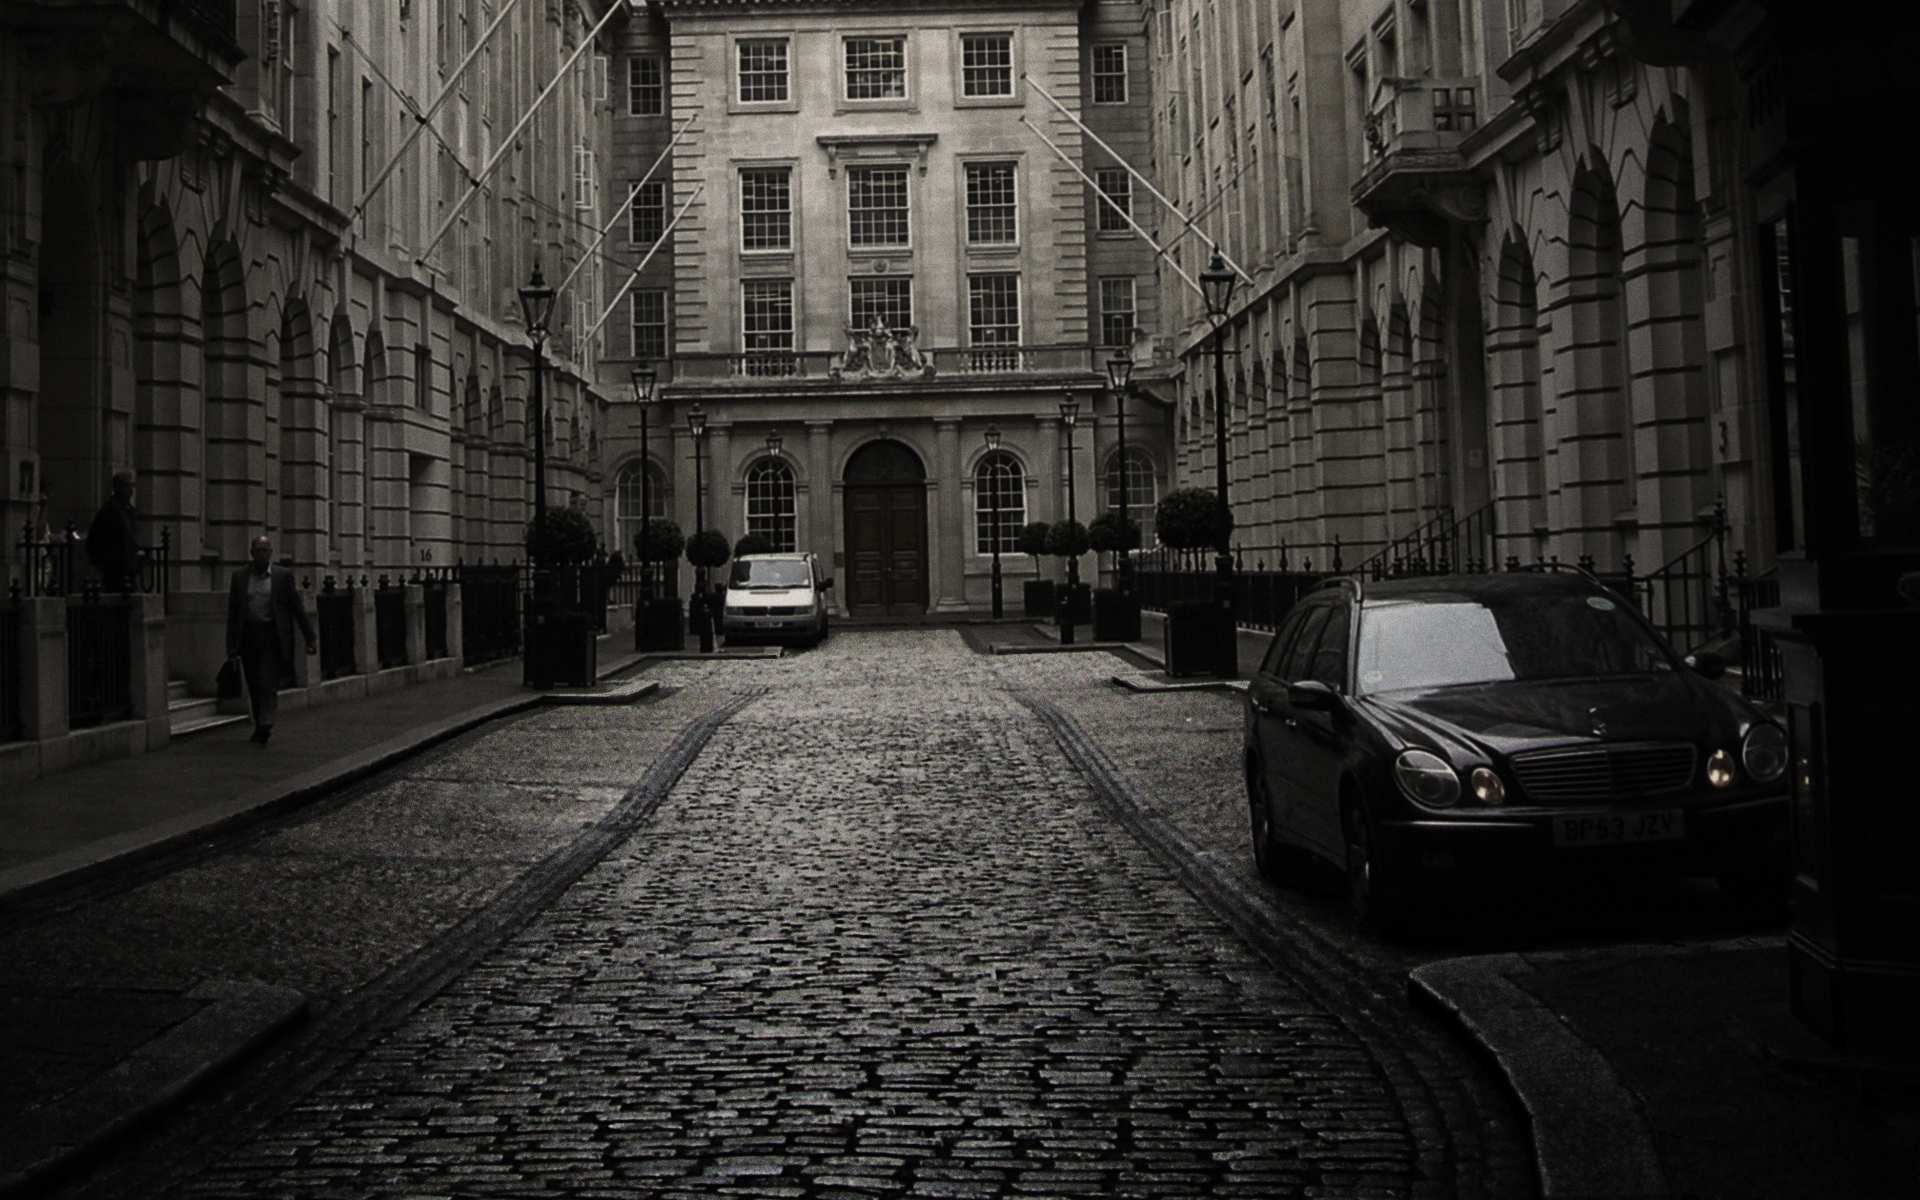 london city black desktop wallpaper webに関わる法律講座